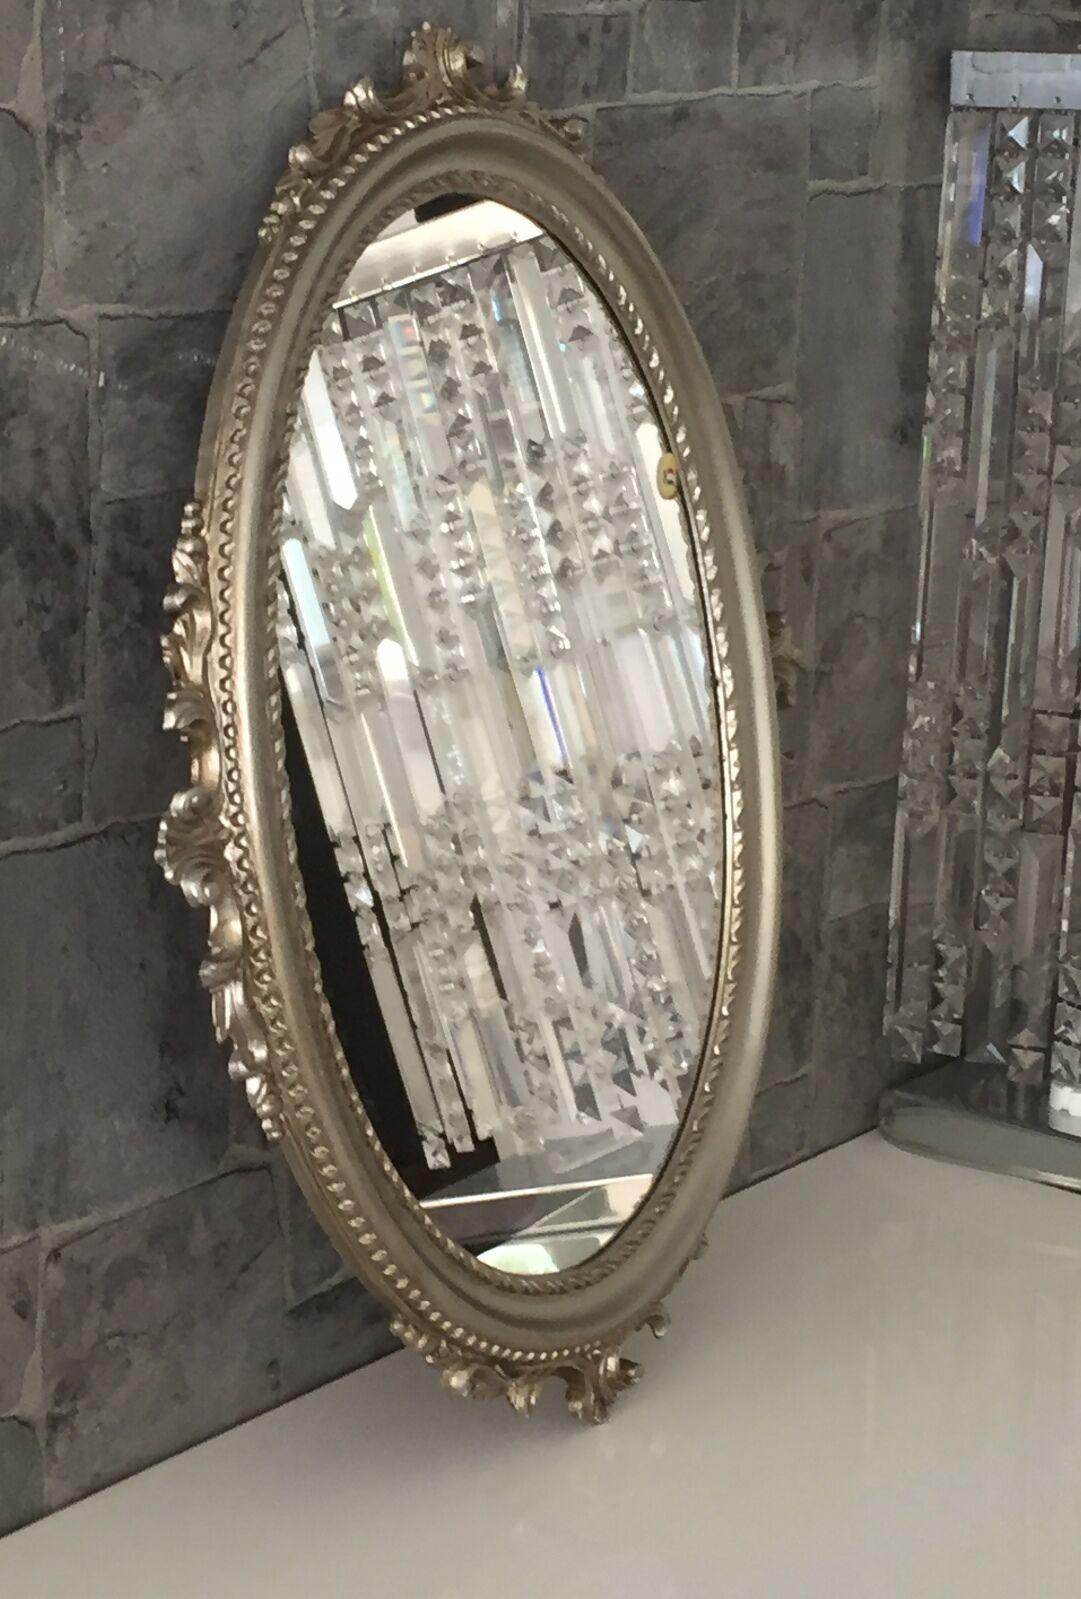 Wandspiegel Antik Silber Oval Barock Badspiegel Spiegel 62x48cm